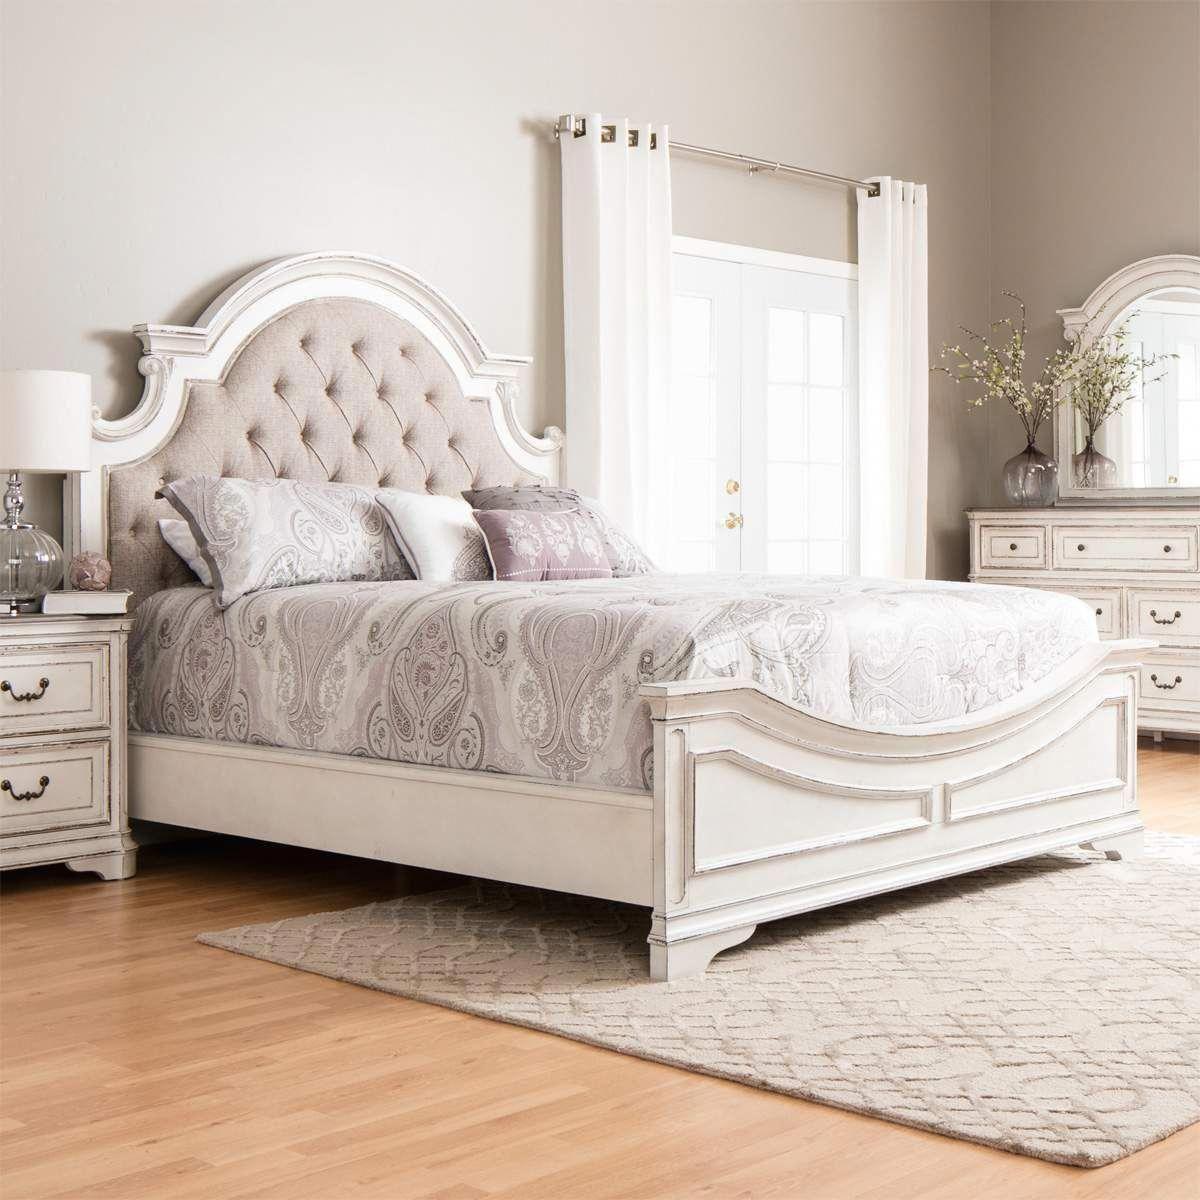 Top Furniture Brands DiscountFurnitureSanDiego Key